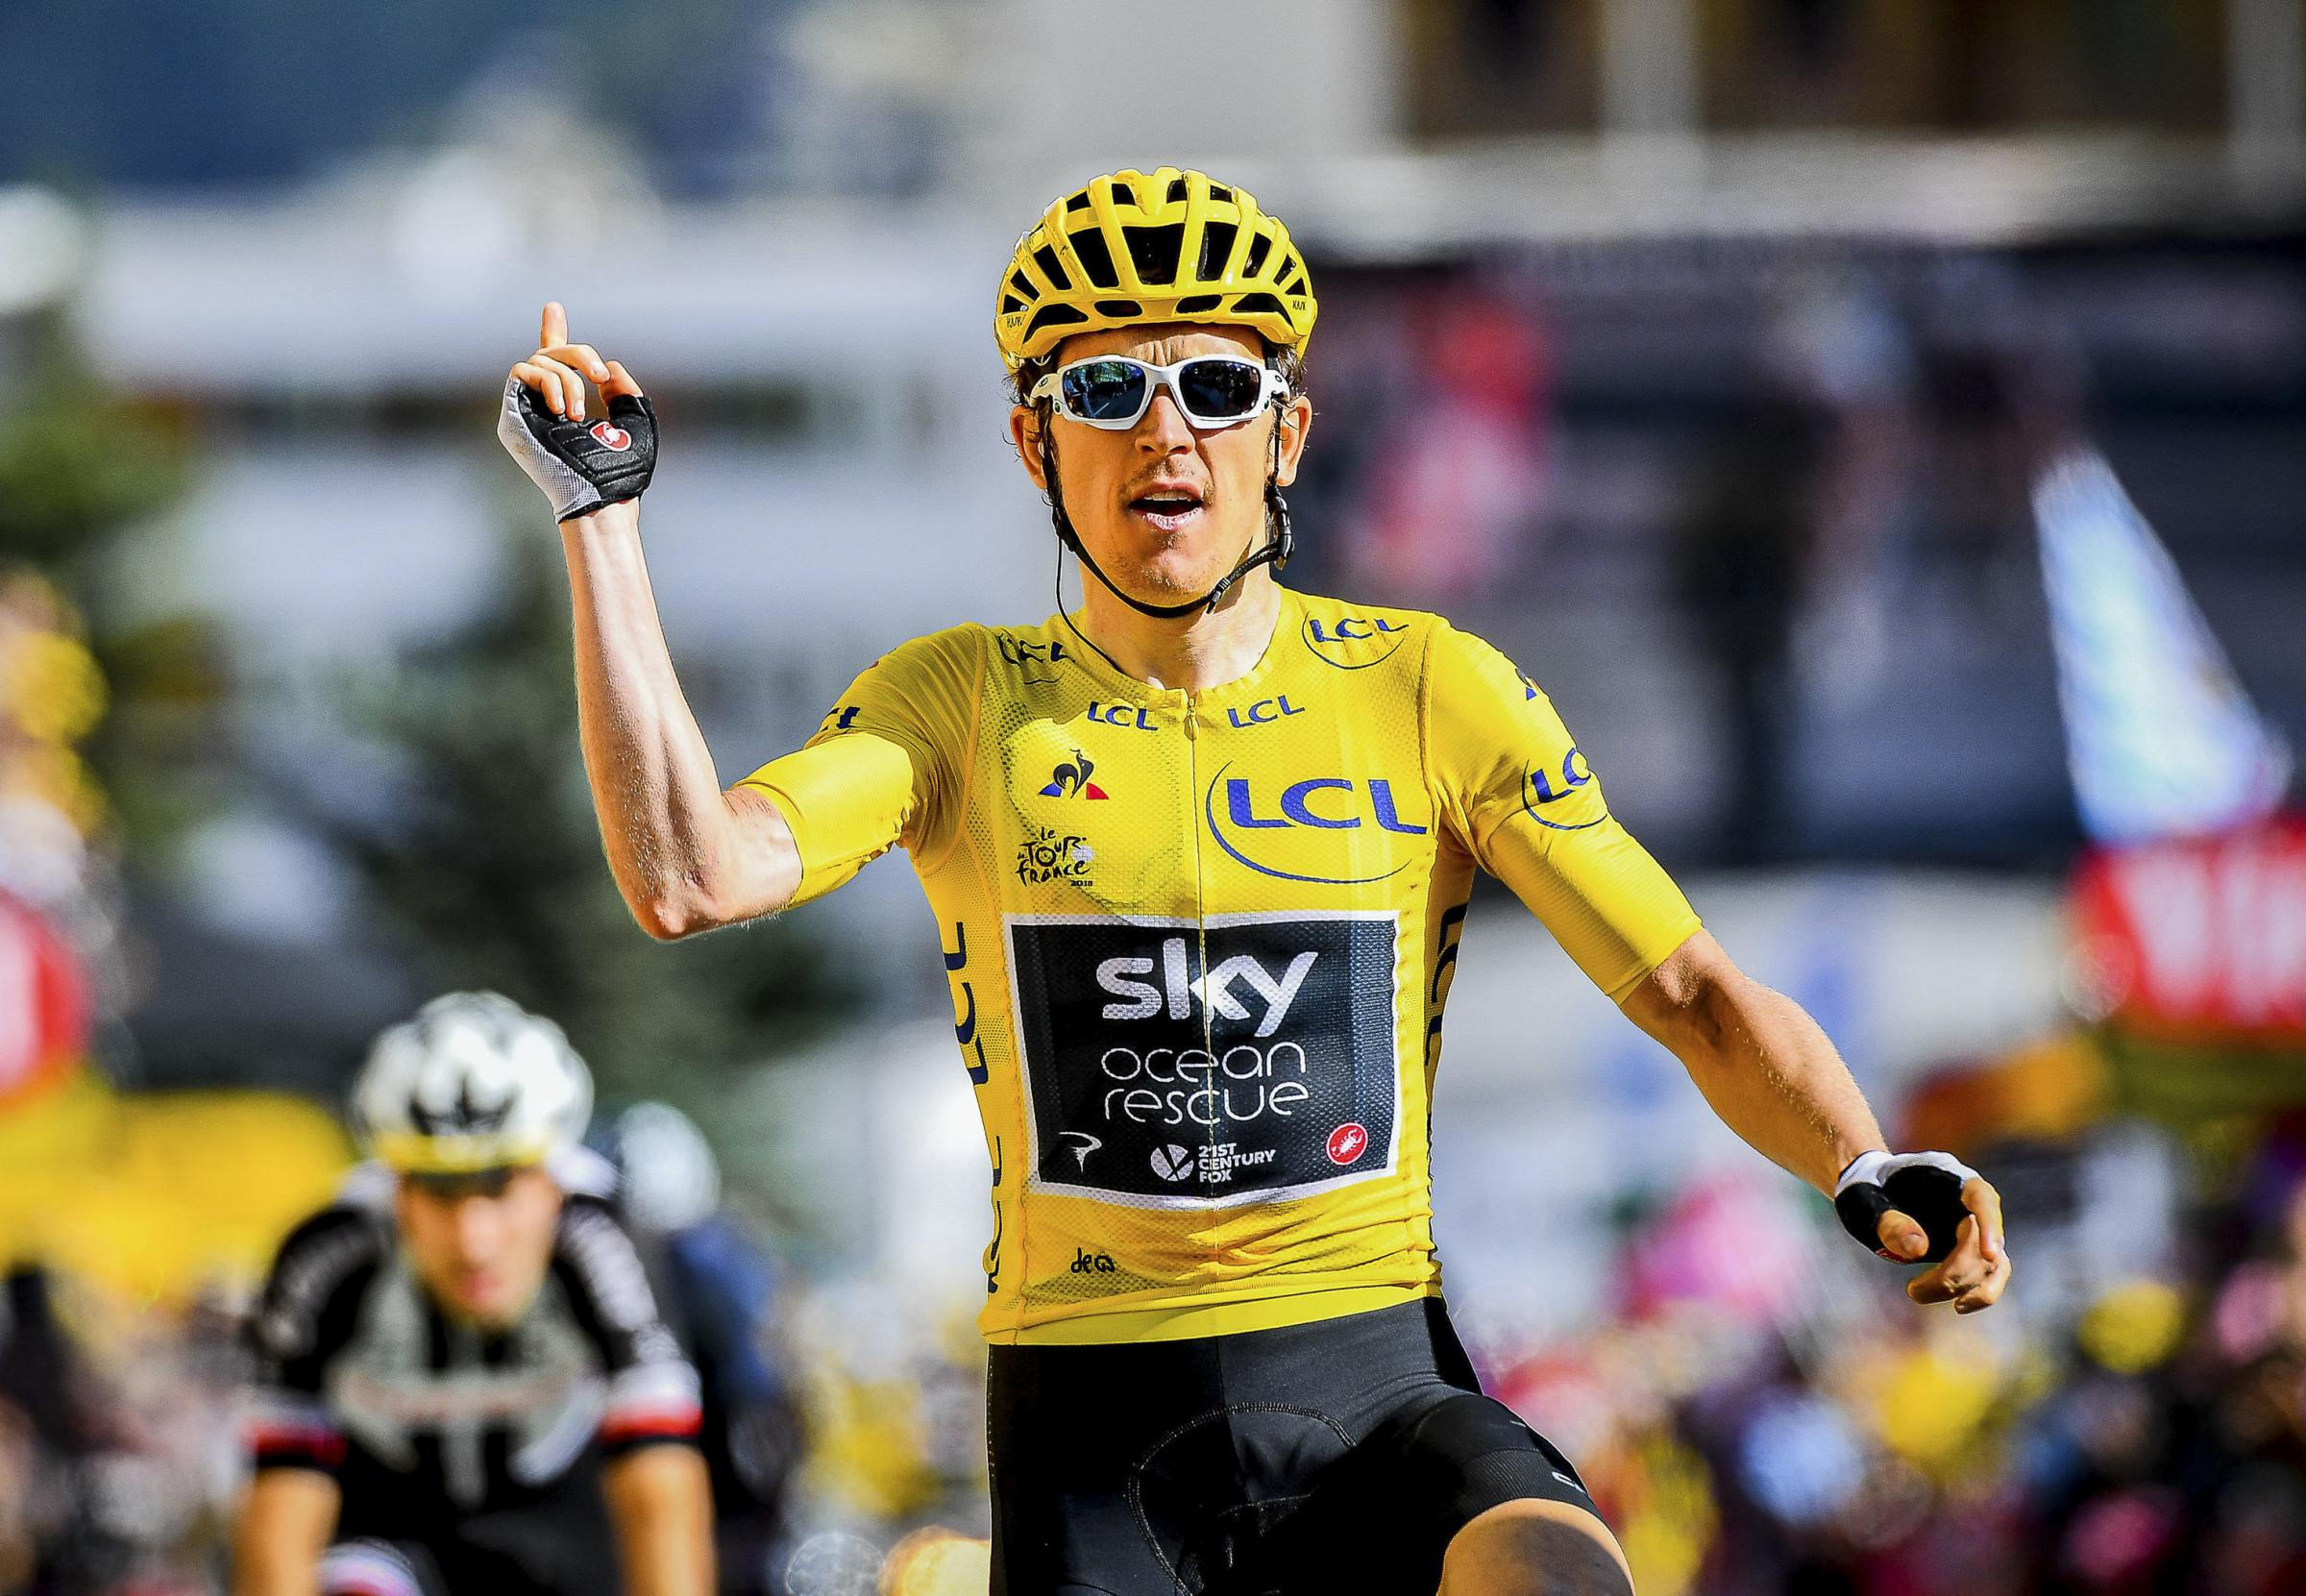 Geraint Thomas making most of savouring Tour triumph